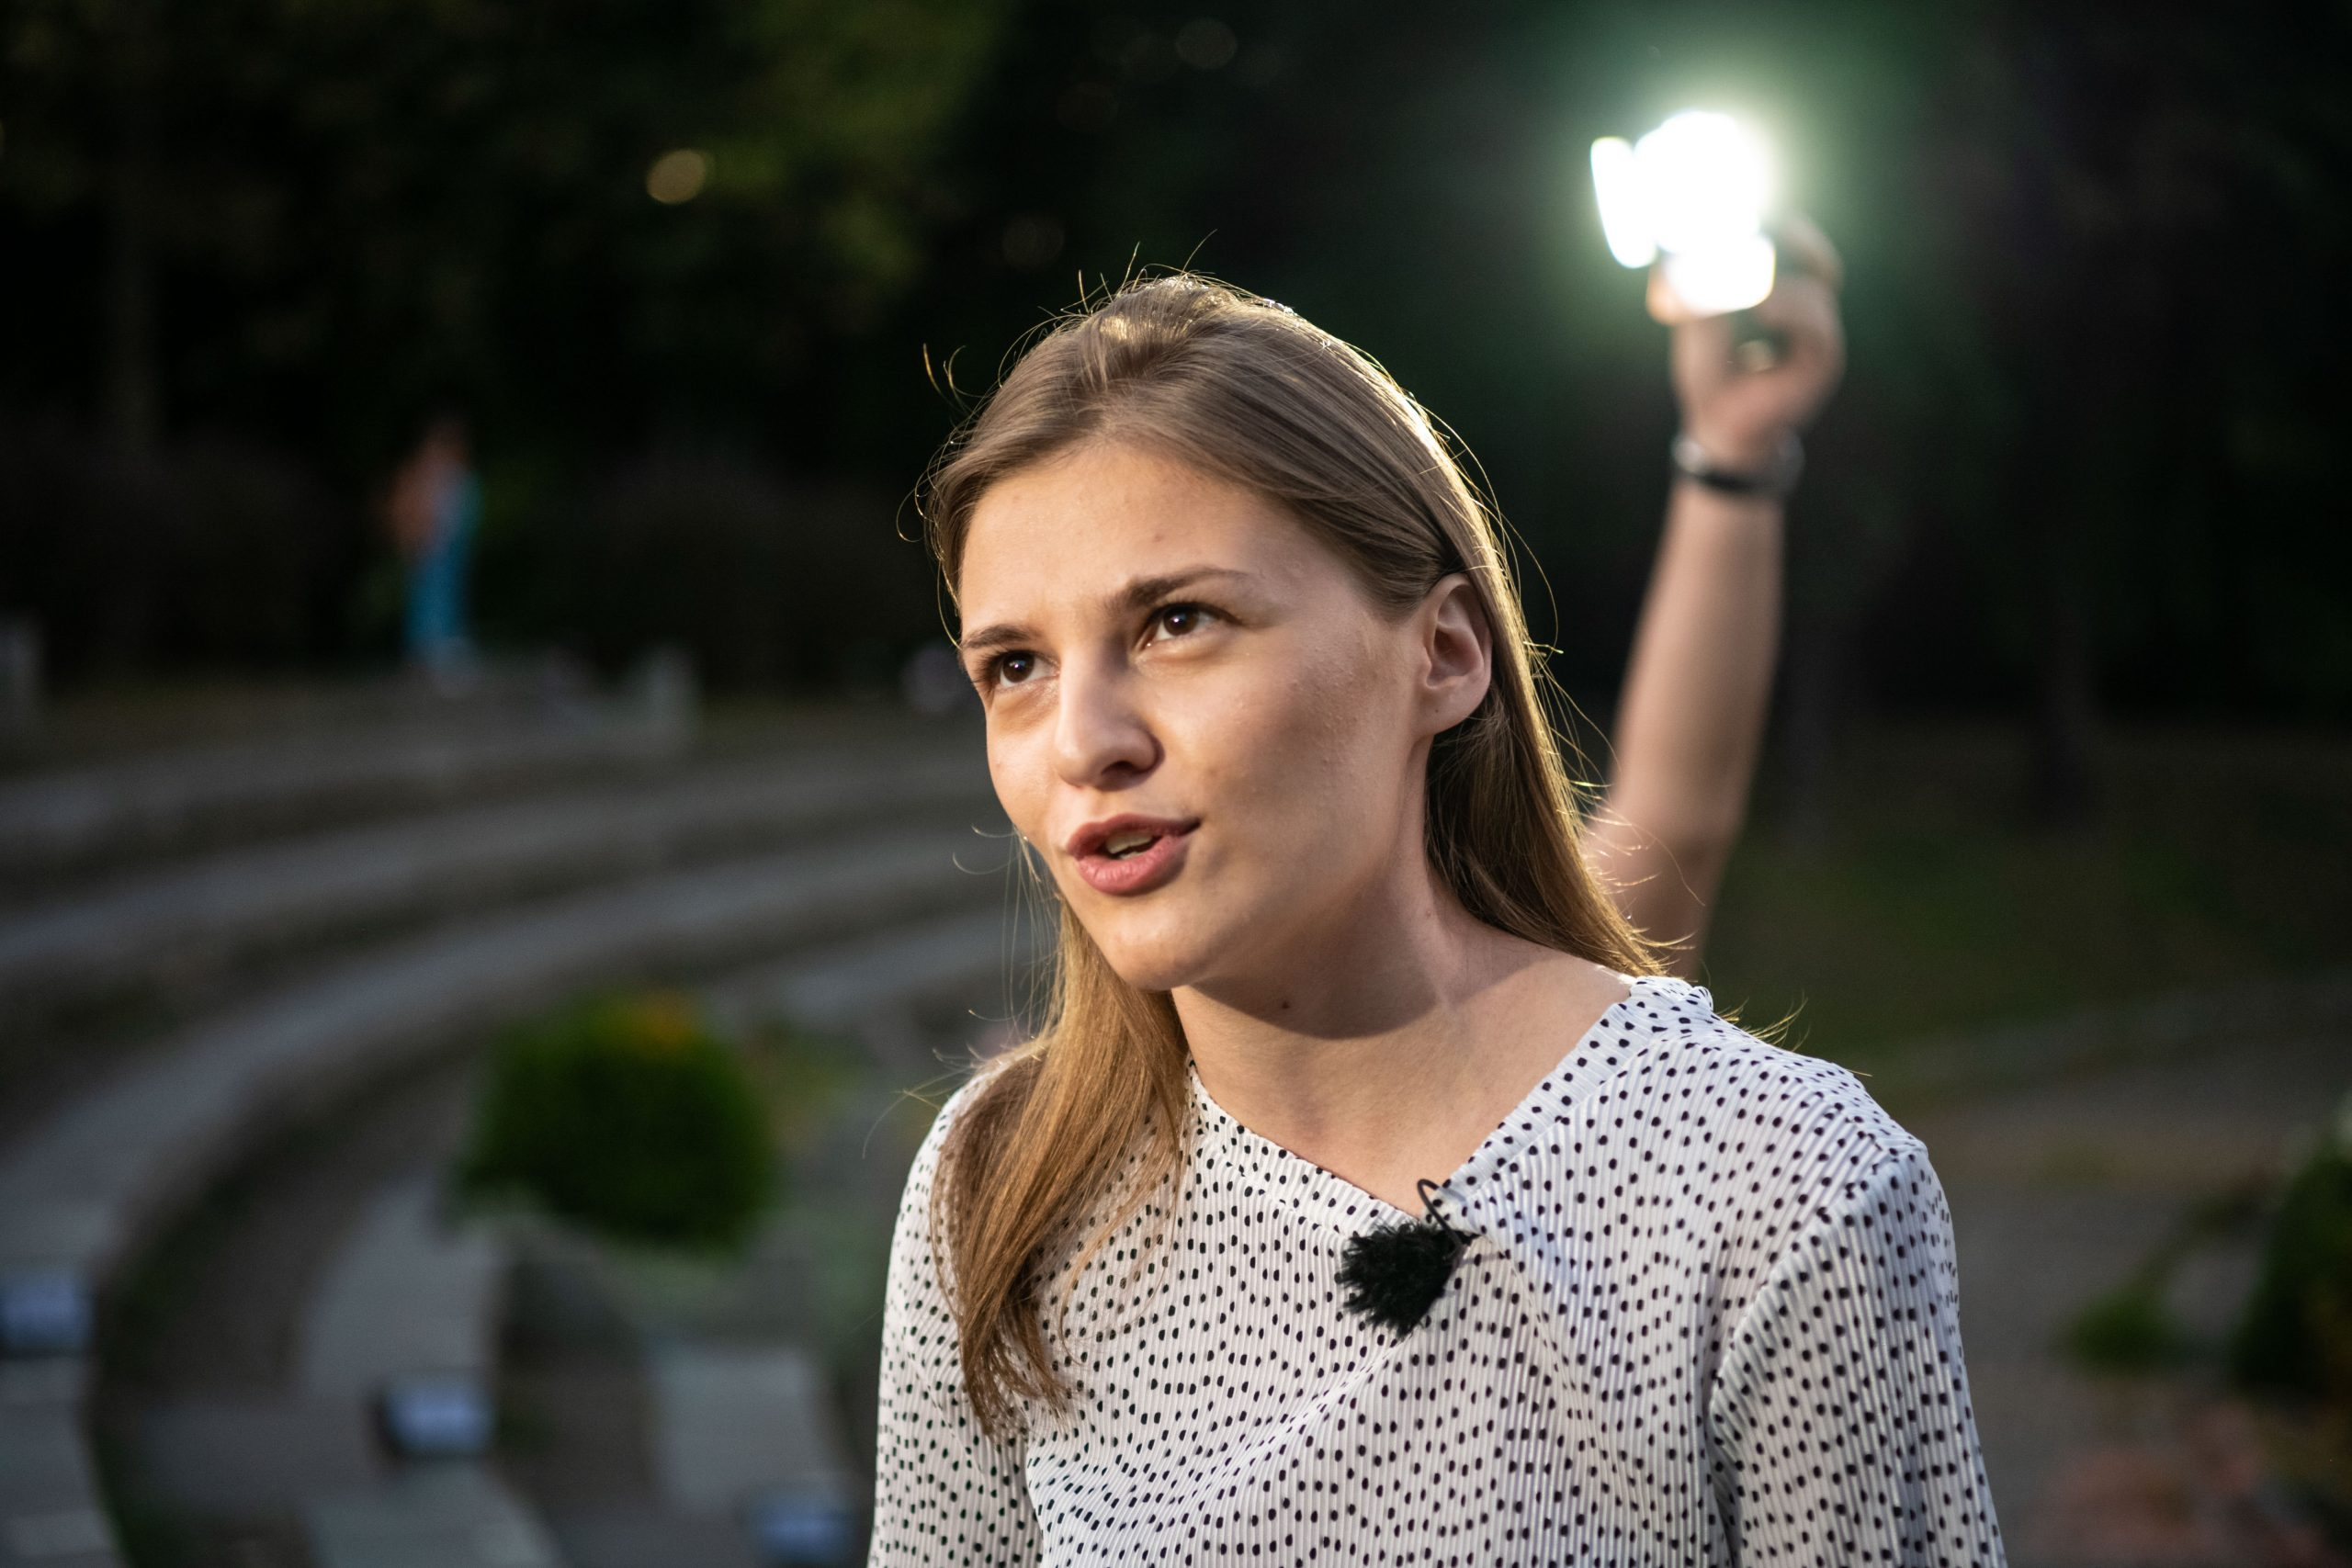 Radmila Petrovic